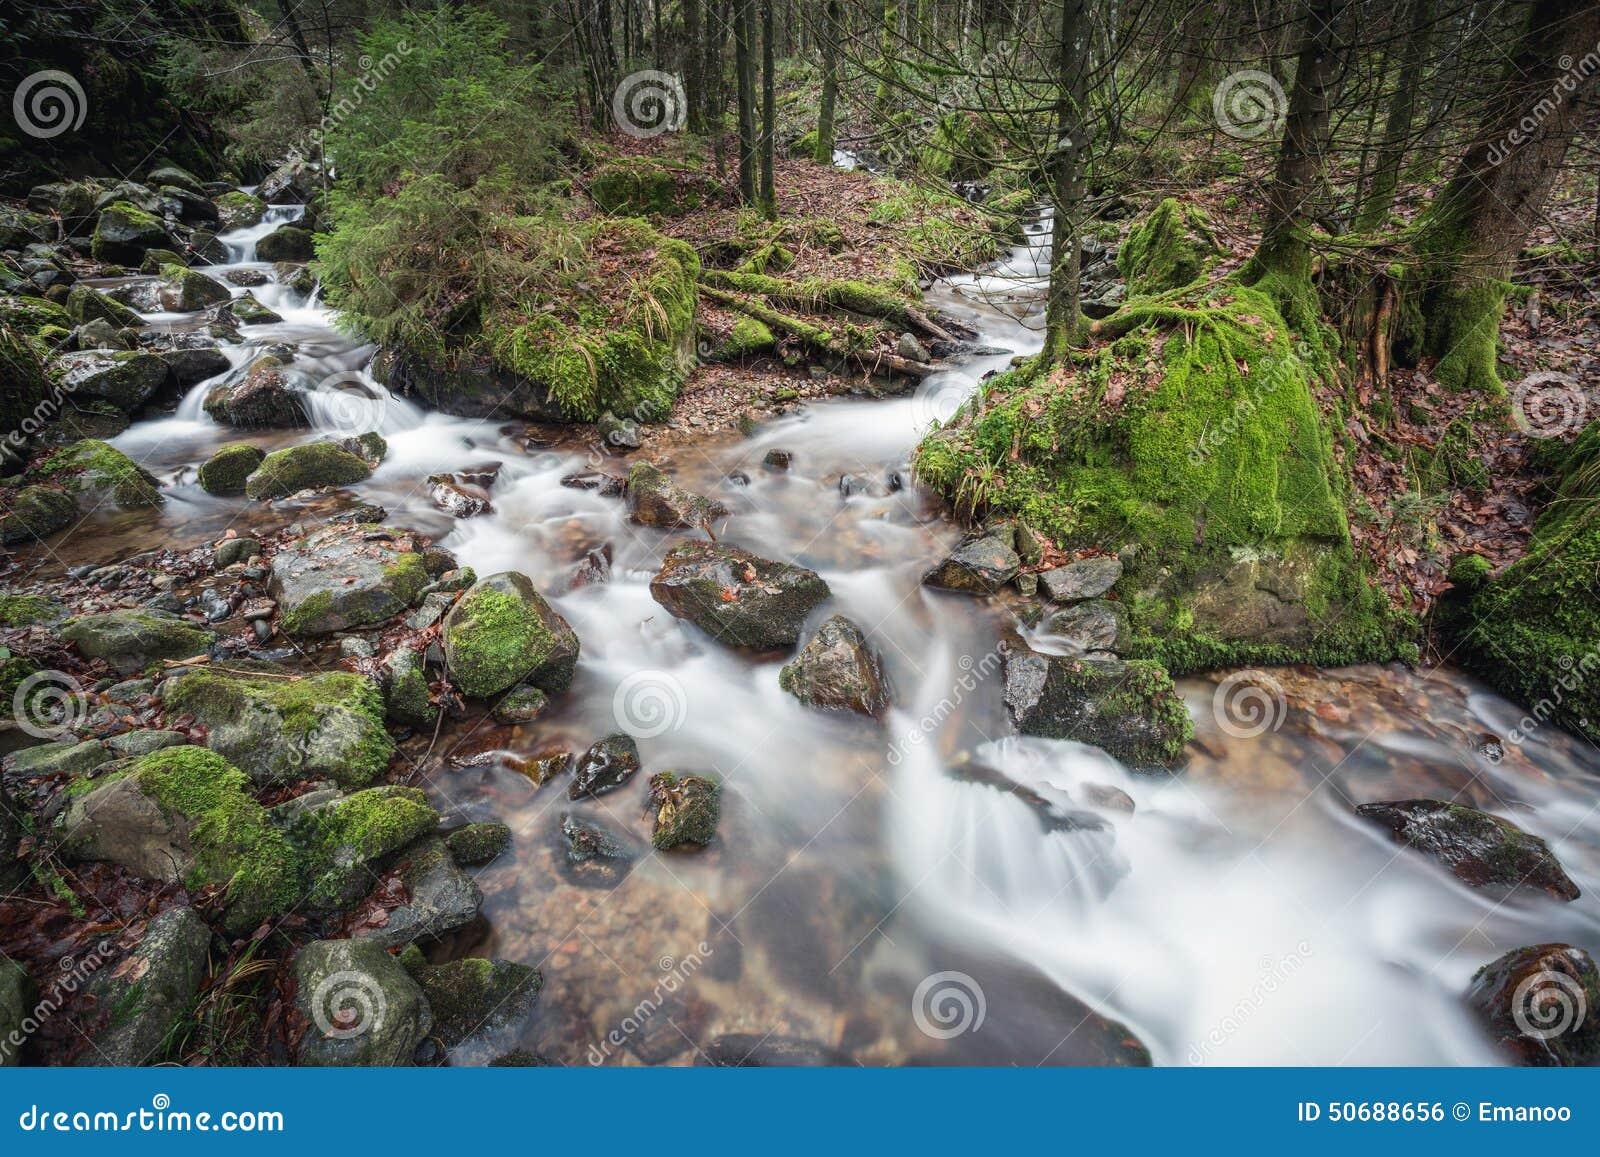 Download 小溪在黑森林,德国里 库存照片. 图片 包括有 石头, 风景, 生气勃勃, 飞溅, 级联, 自然, 投反对票 - 50688656